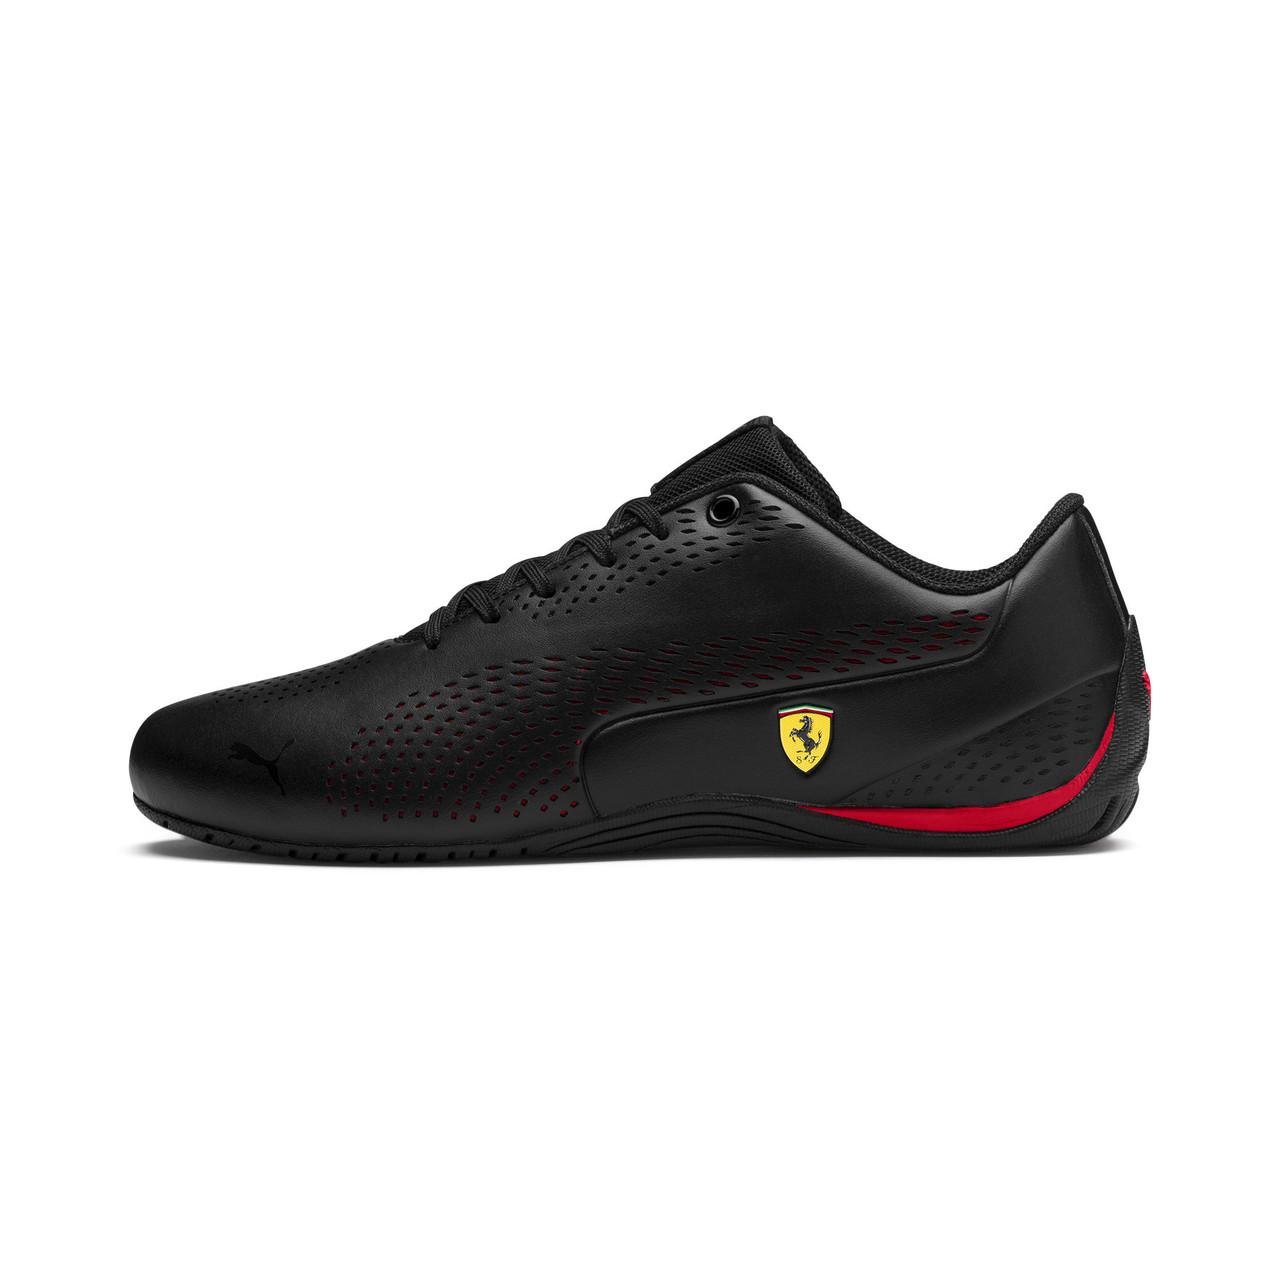 Кроссовки спортивные мужские  Scuderia Ferrari Drift Cat 5 Ultra II Men's Shoes